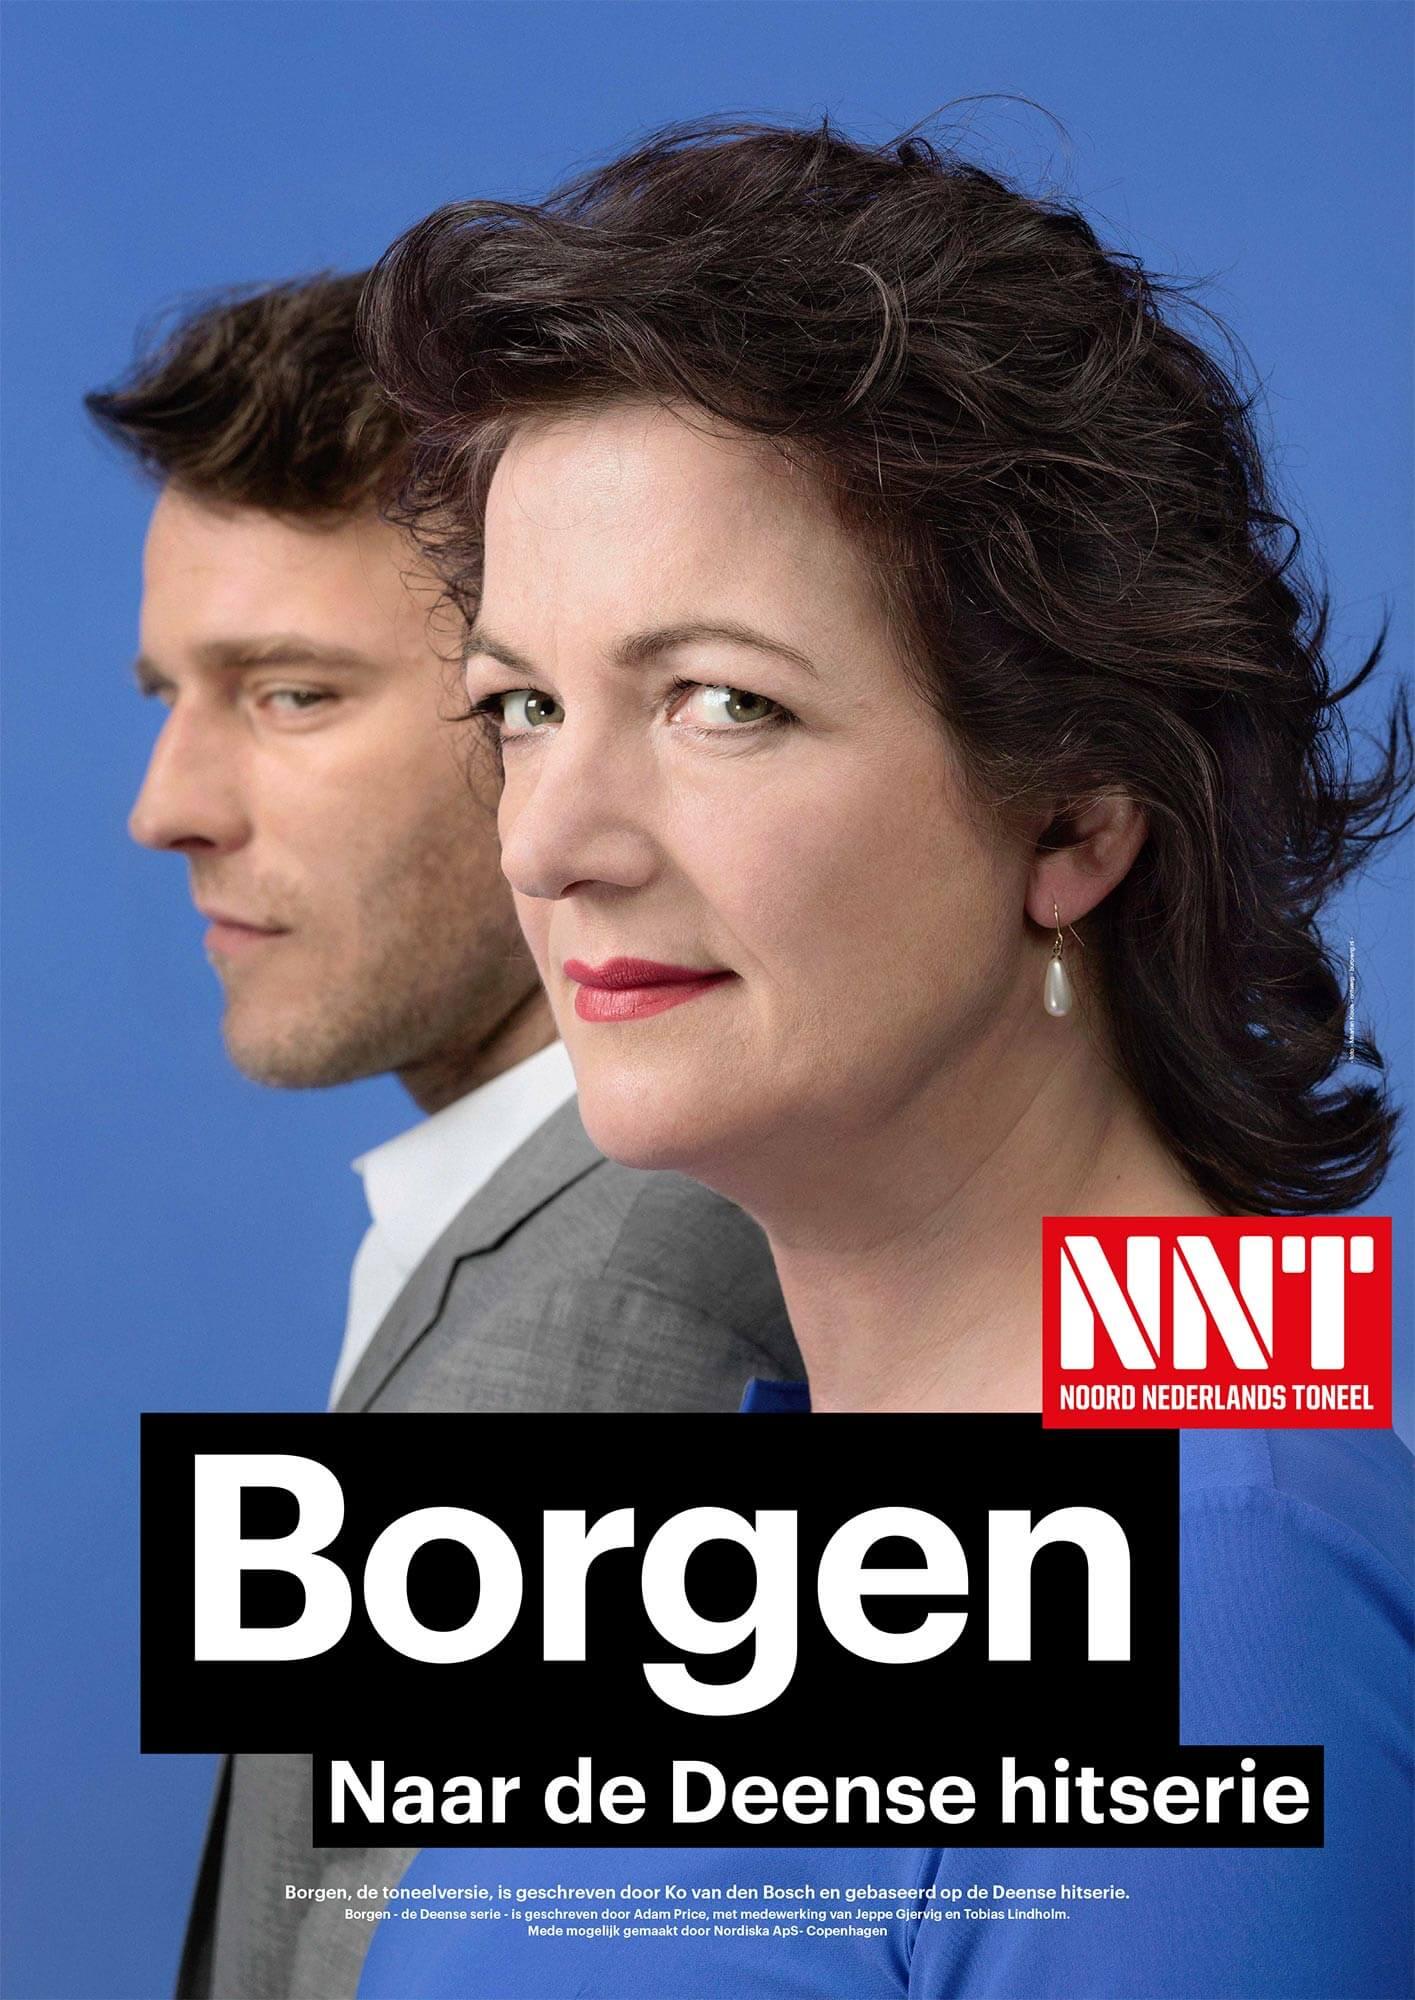 Campagne NNT Borgen campagne affiche Malou Gorter en Peter Vandemeulebroecke